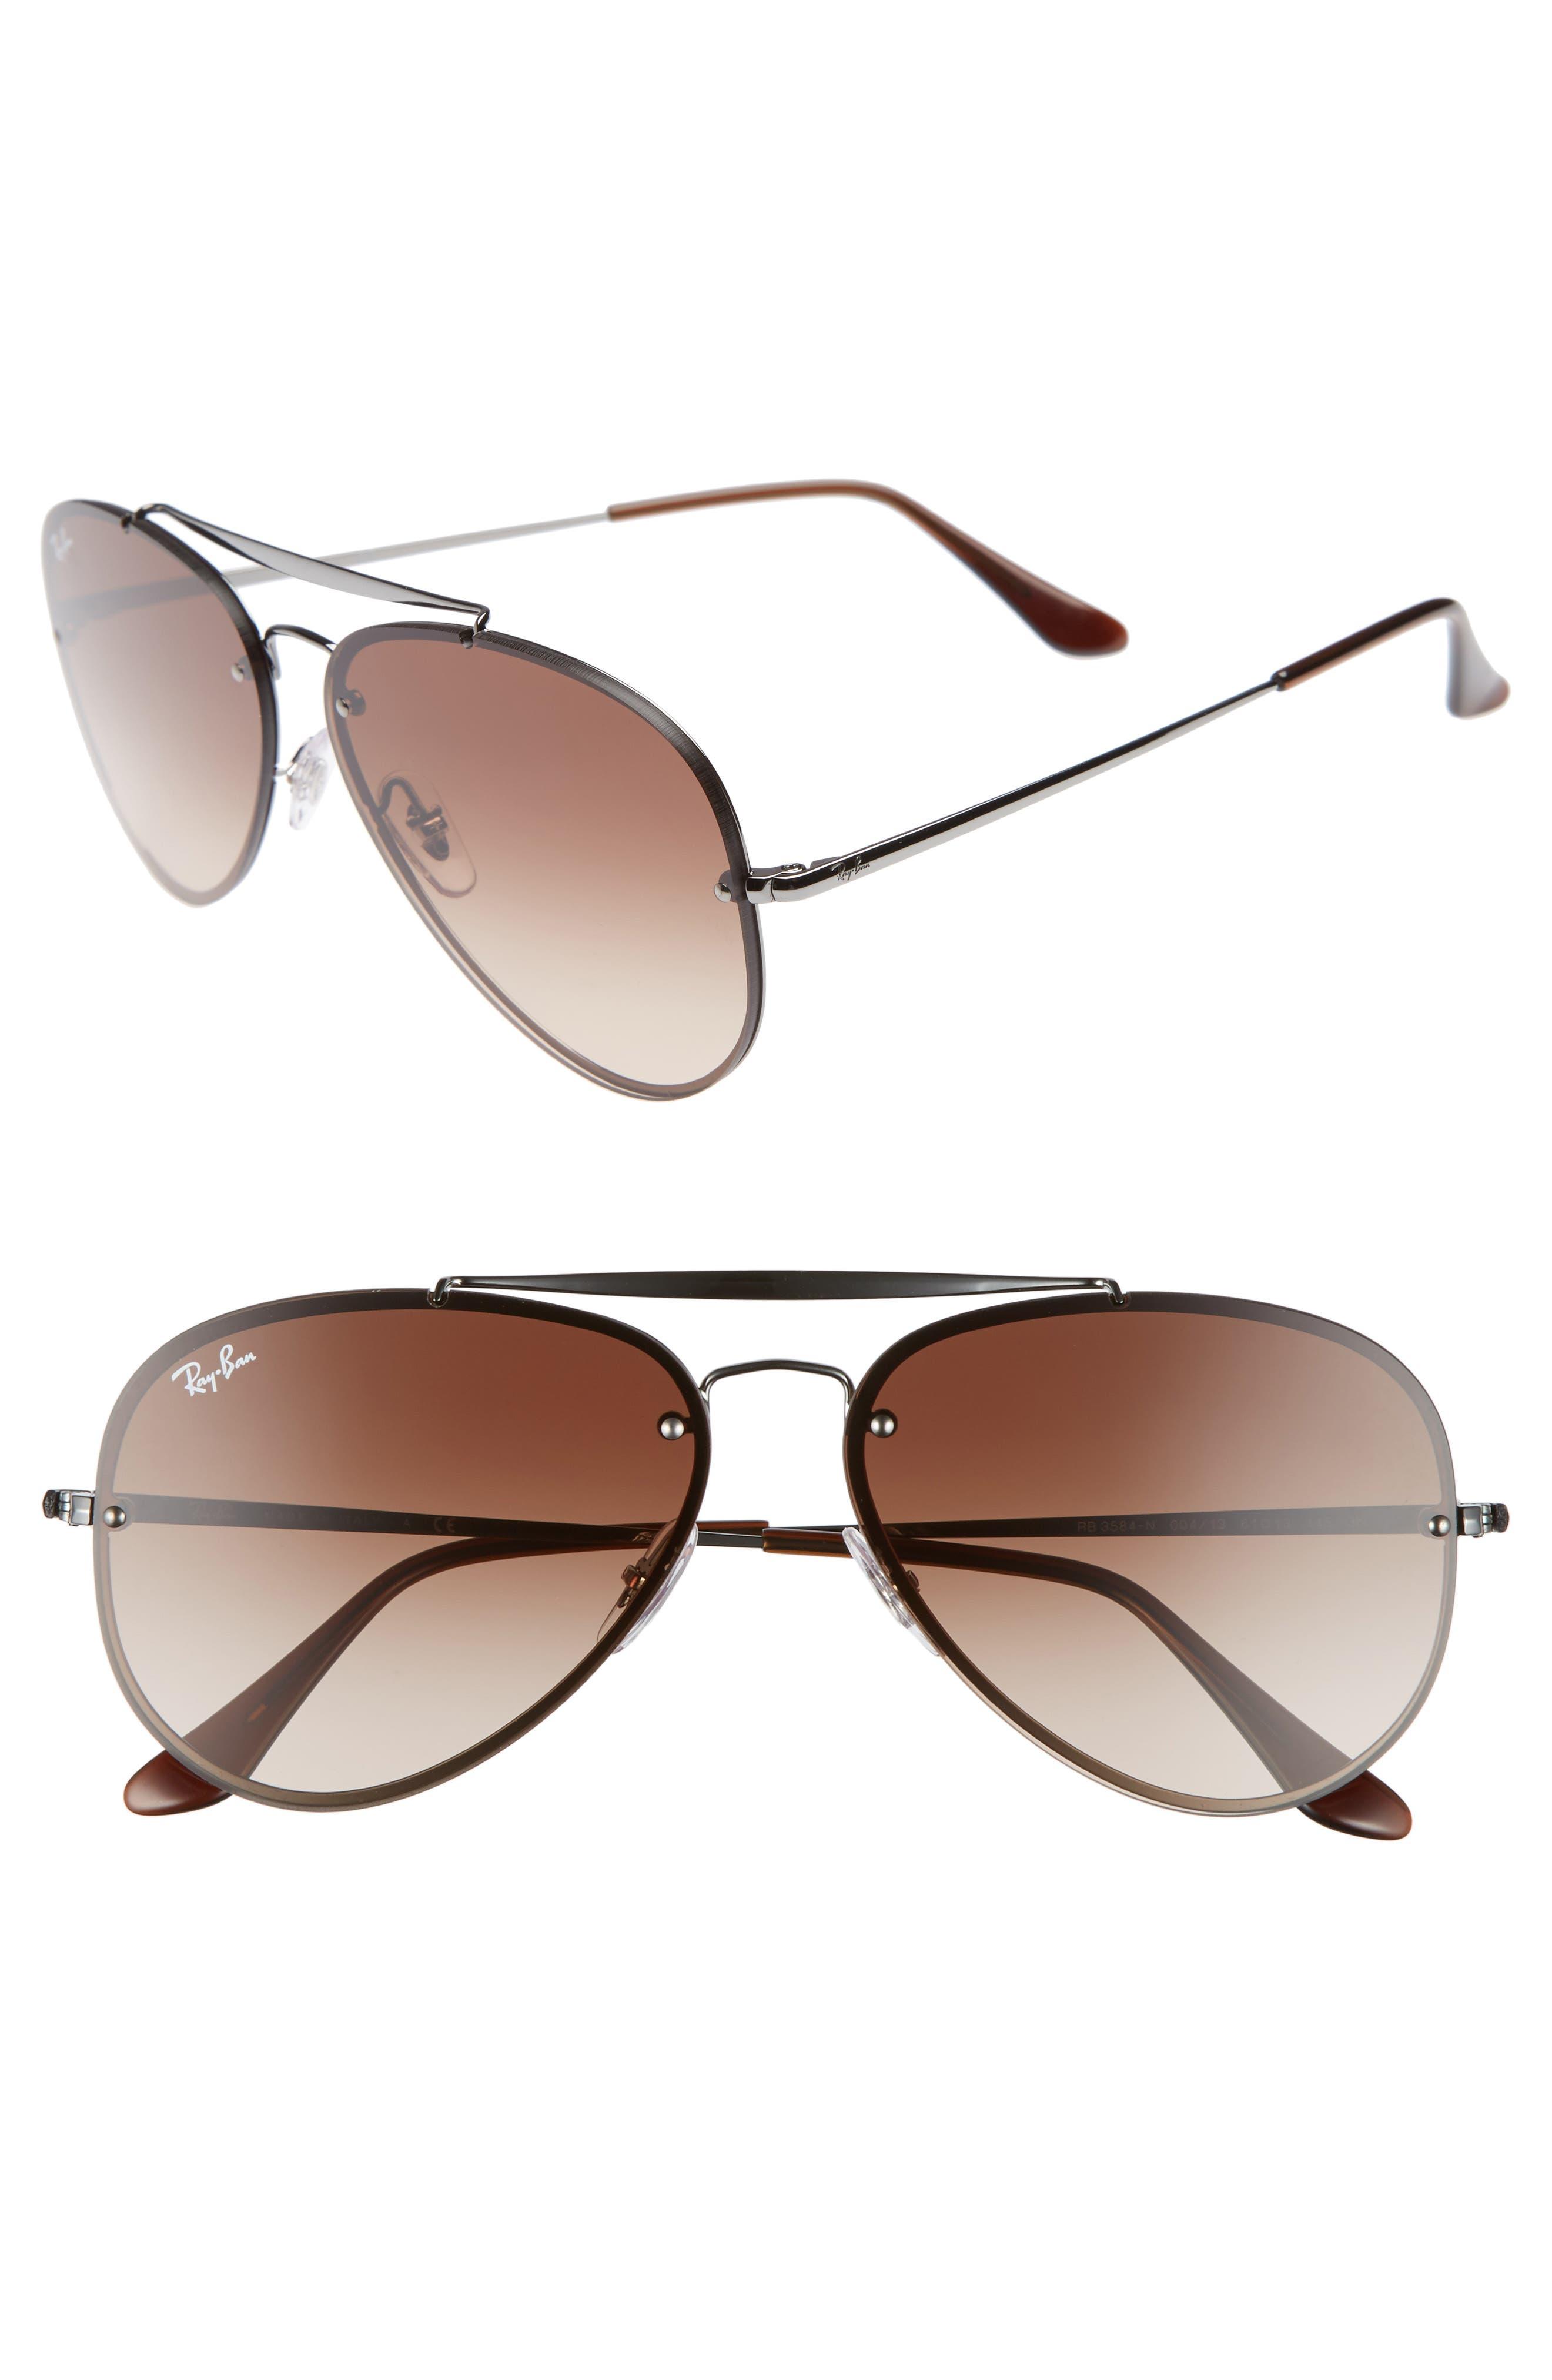 Blaze 61mm Aviator Sunglasses,                         Main,                         color, Gunmetal/ Brown